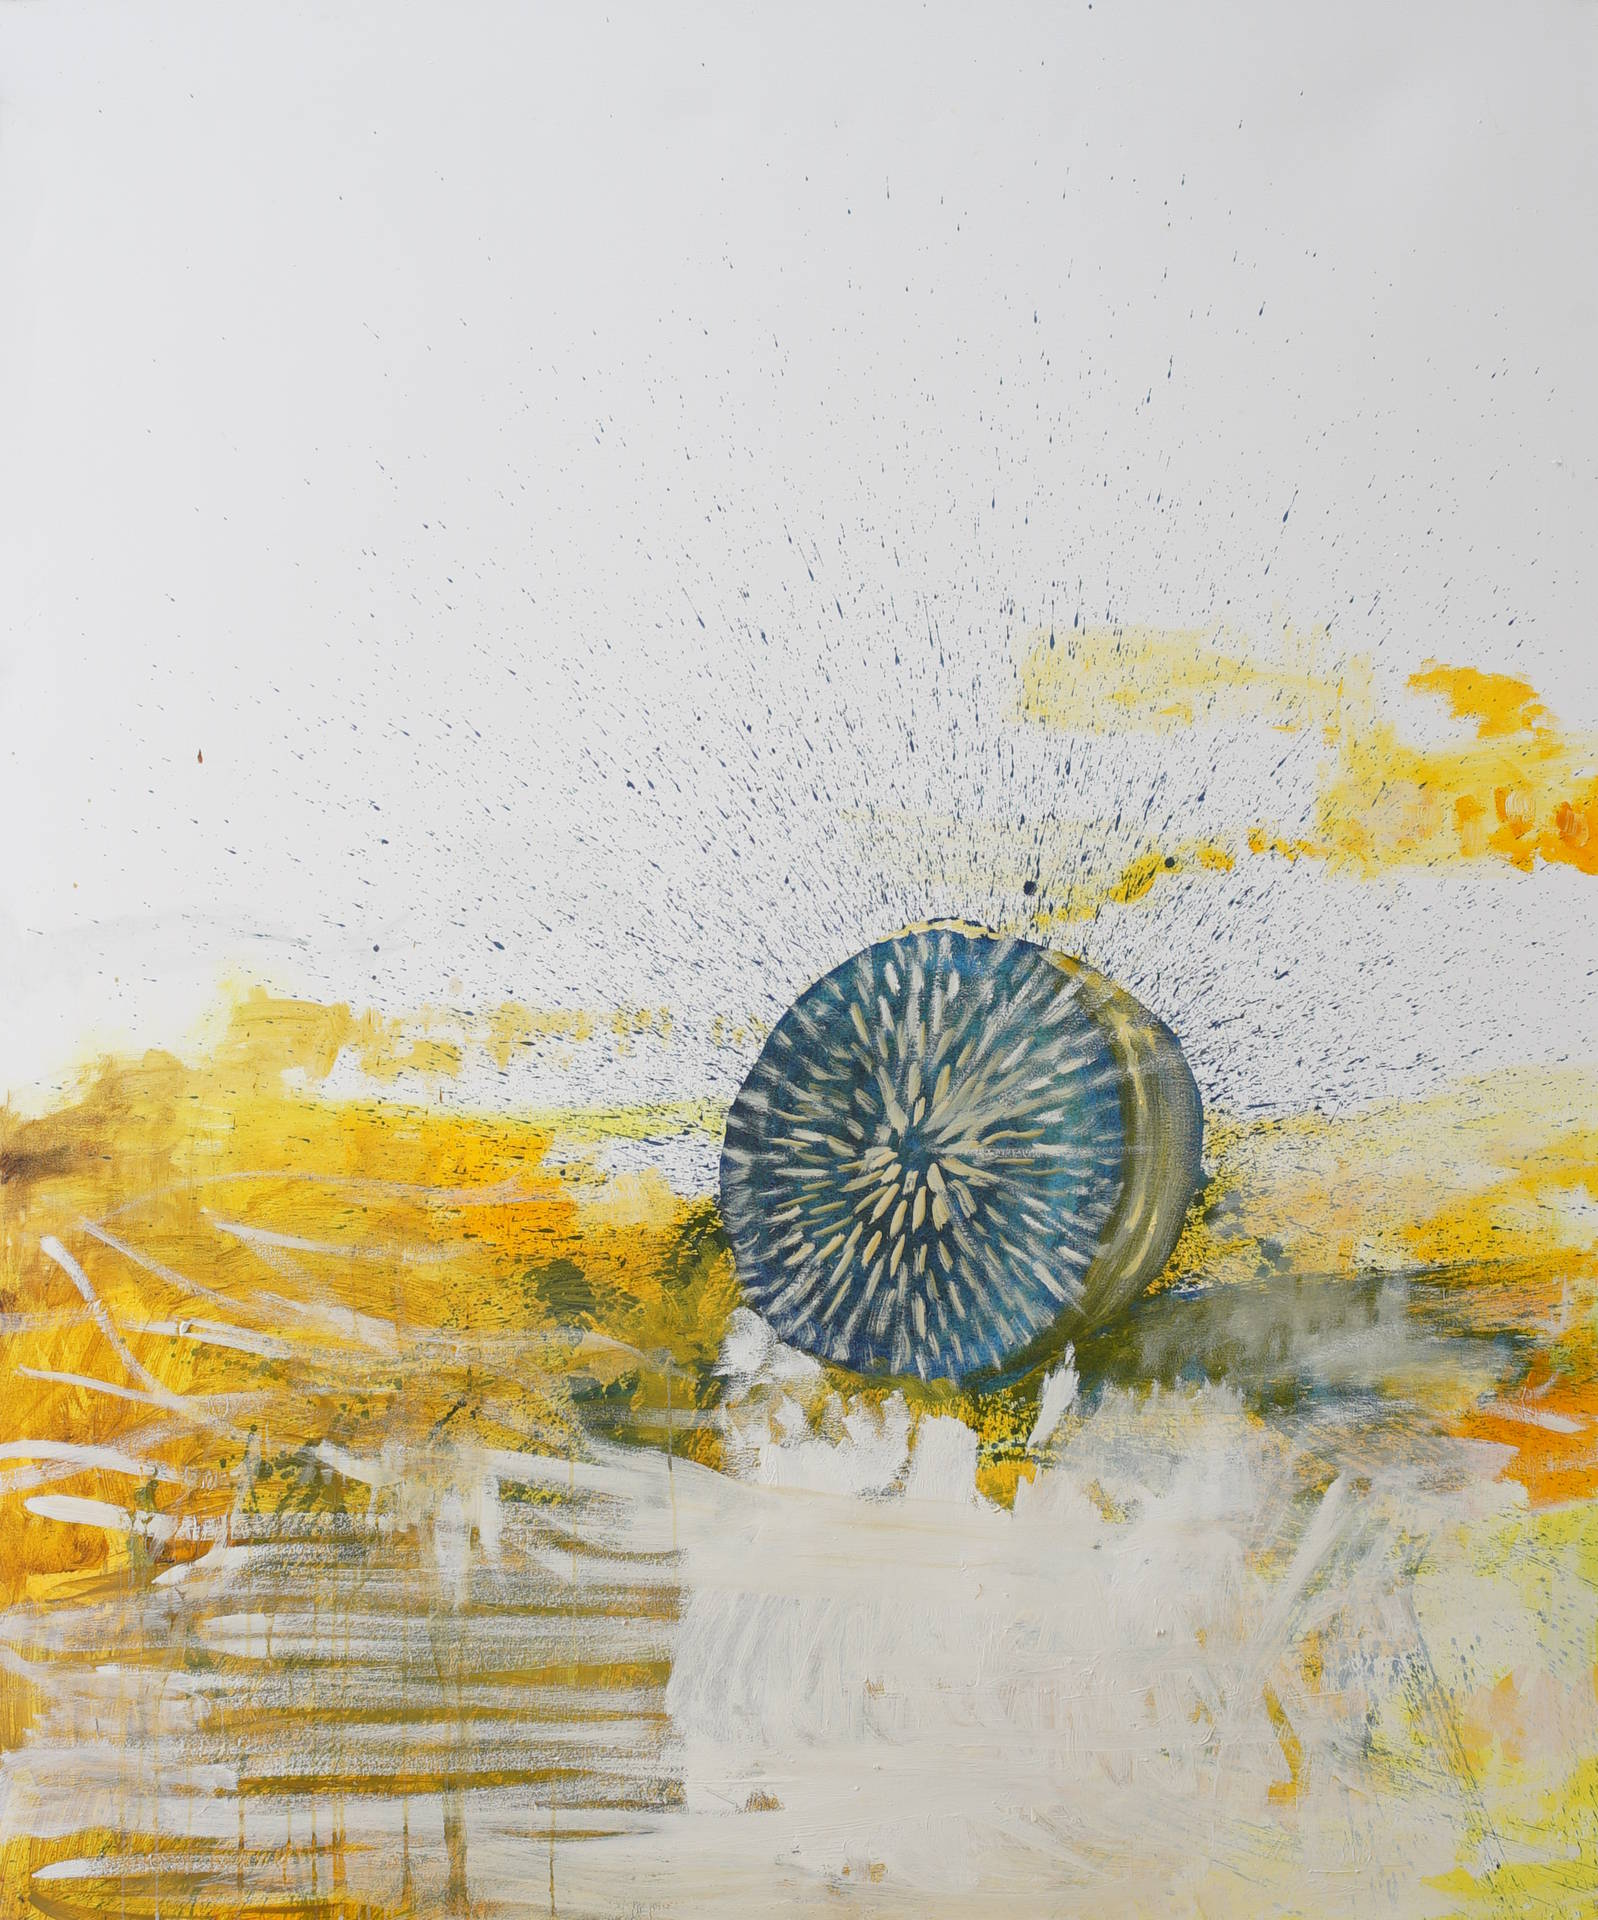 Starrender Heuballen (staring hay bale) by Jonas Hofrichter, 2014. Oil on canvas, 180 x 150 cm